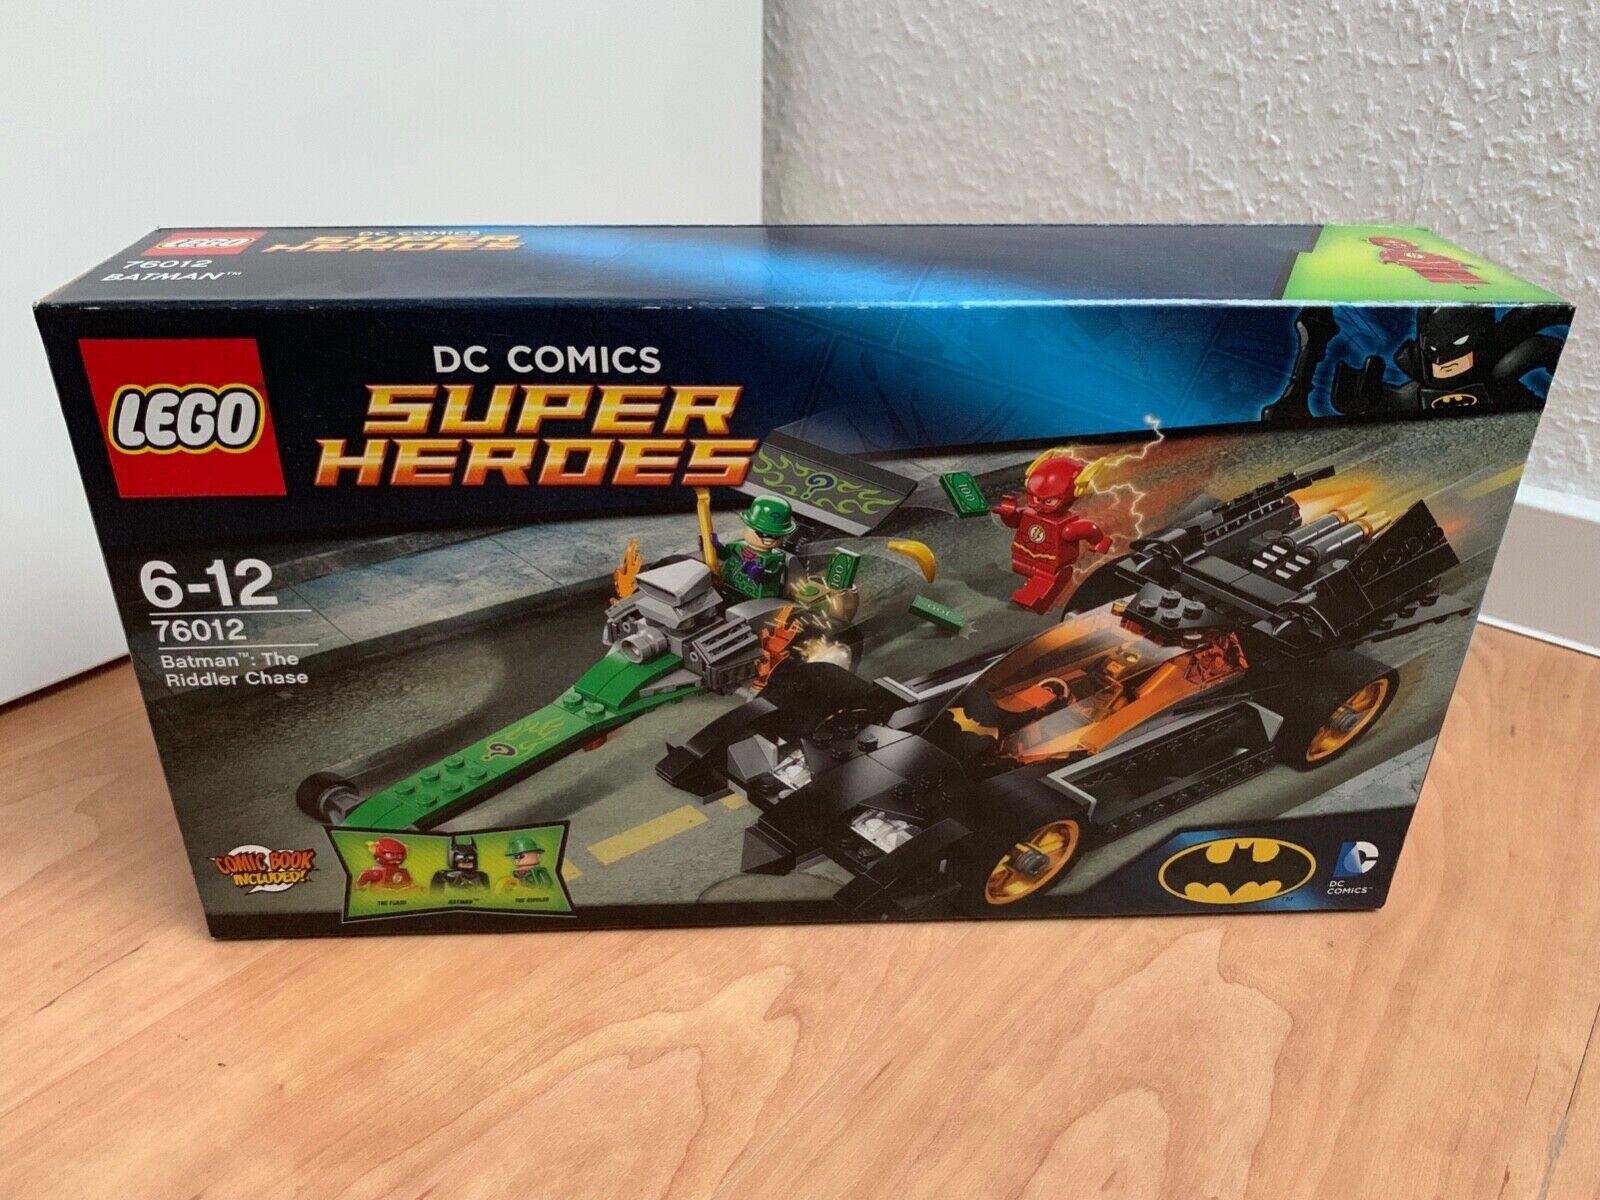 LEGO ® DC Comics Super Heroes Batman The Riddler Chase   76012   NEU & OVP